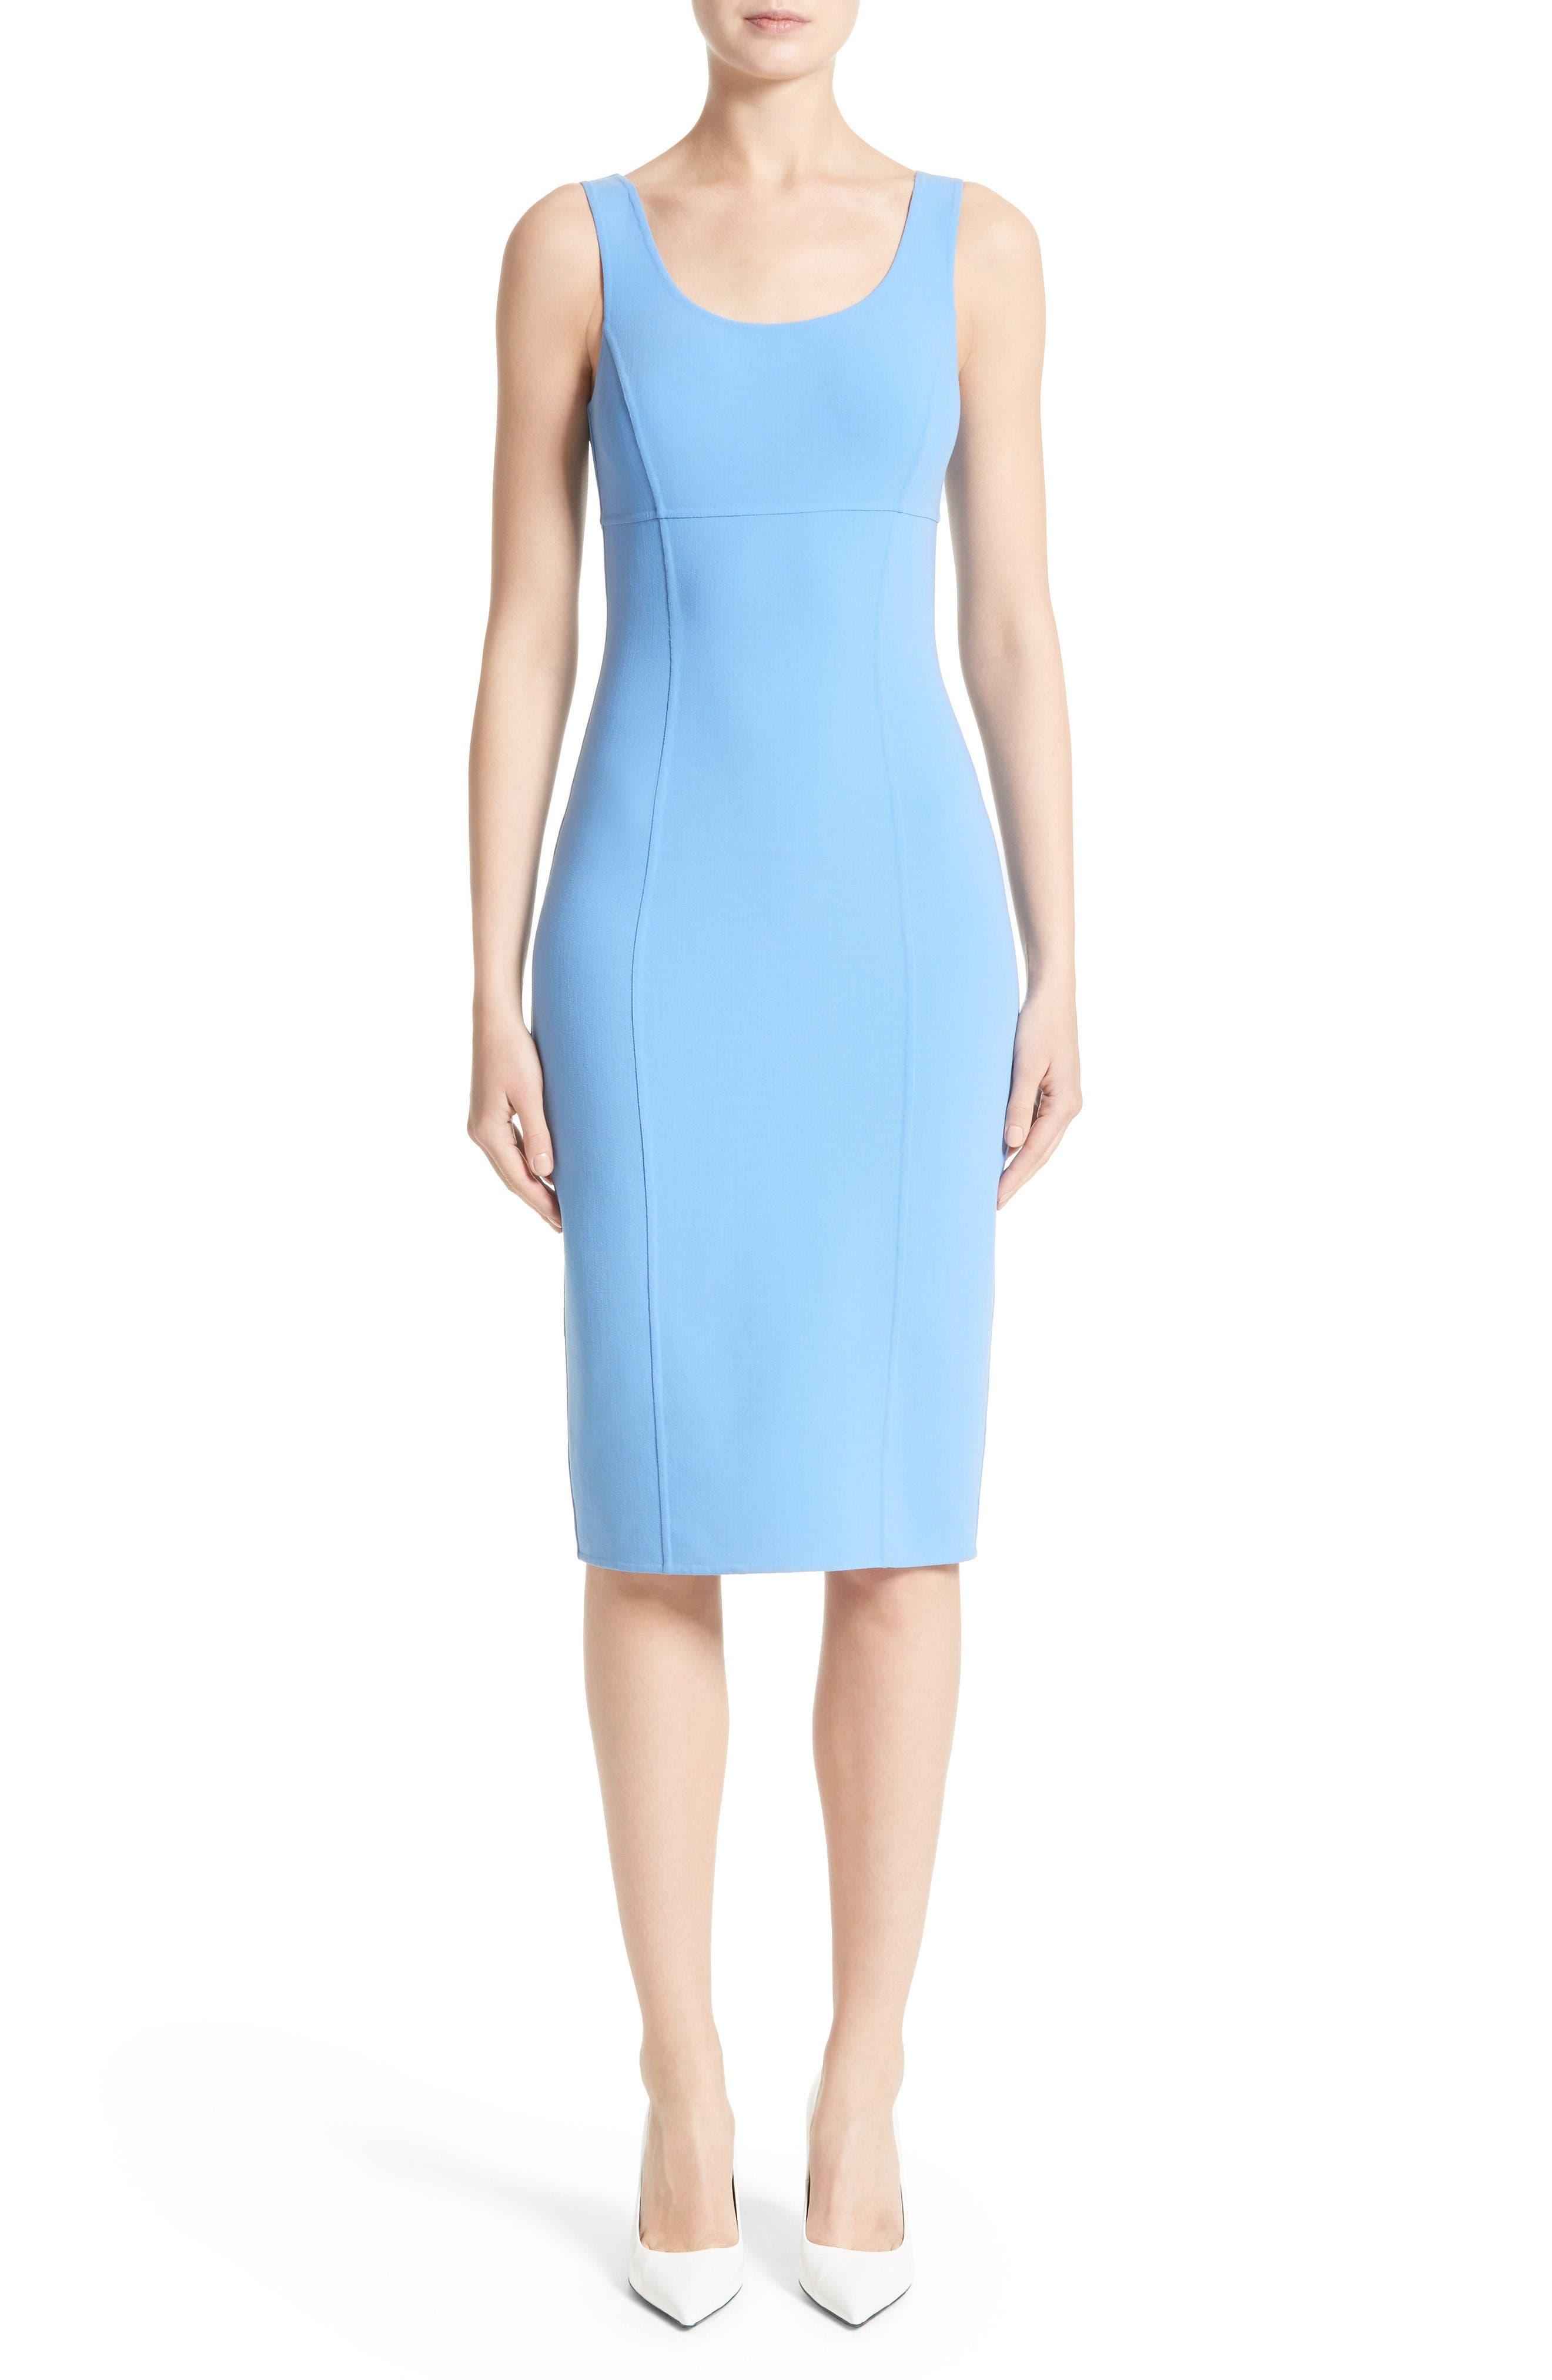 Main Image - Michael Kors Stretch Wool Crepe Sheath Dress